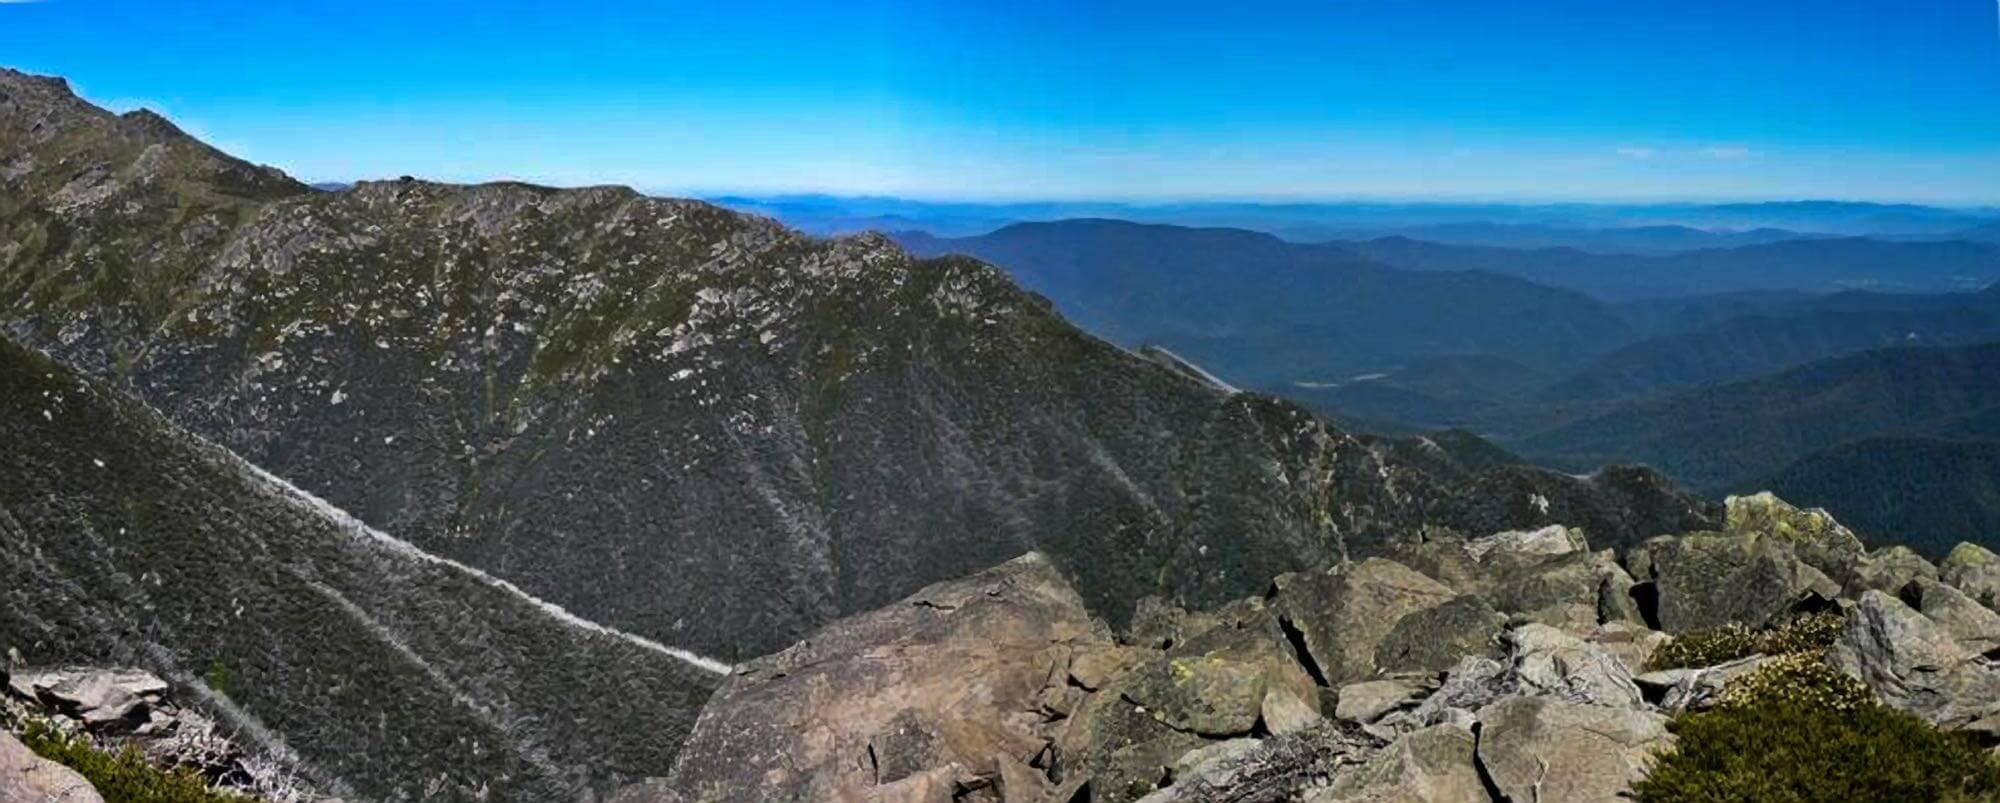 Kosciuszko Towards Upper Murray from Sentinel